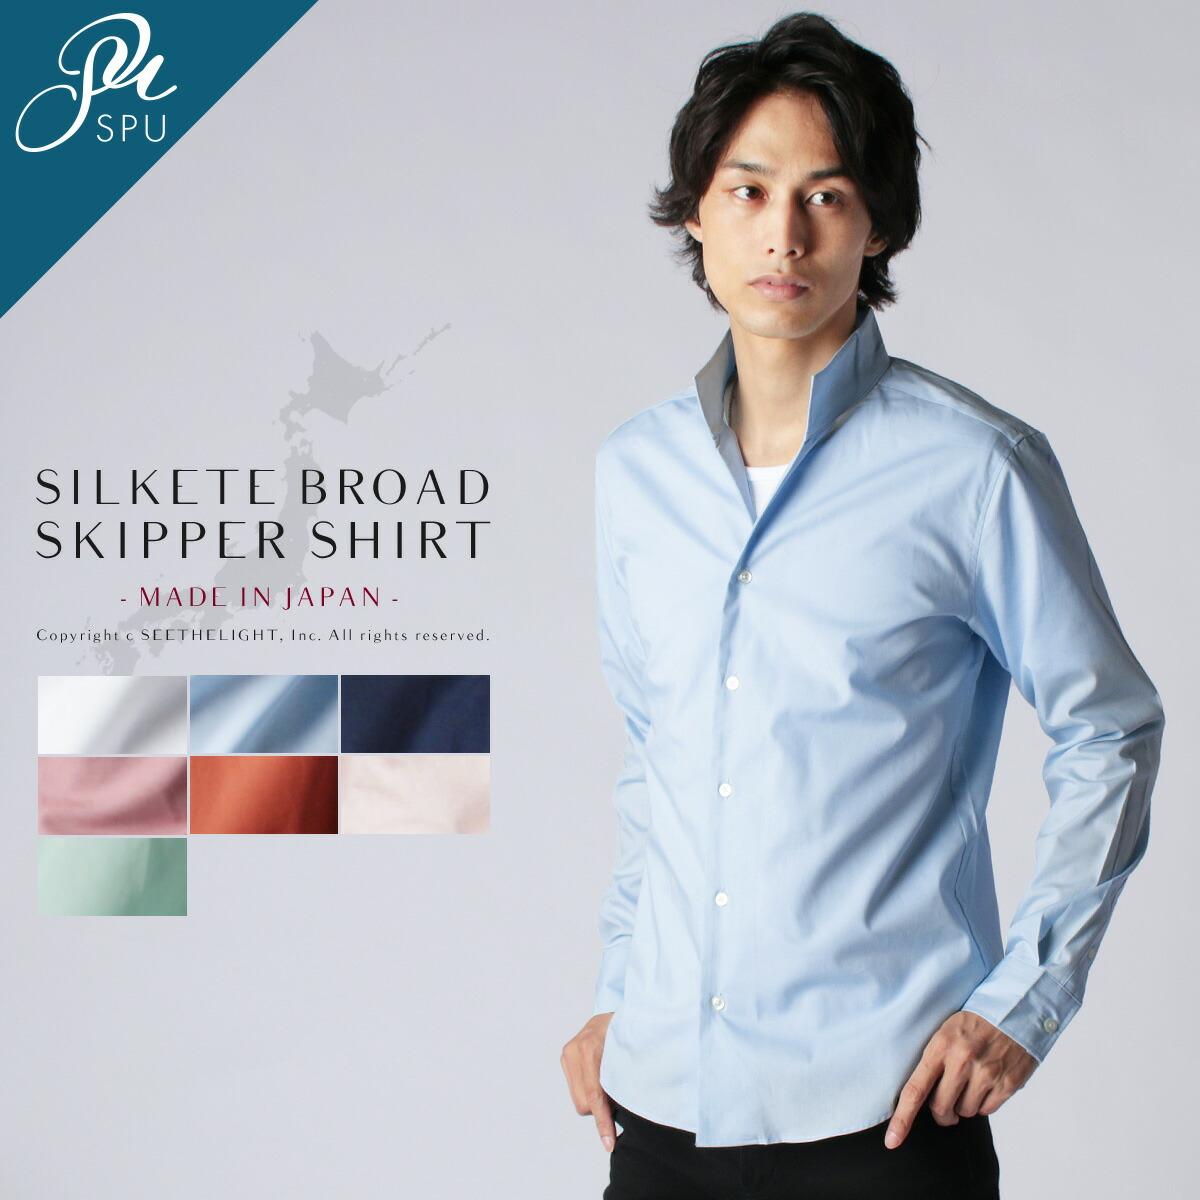 SPU スプ メンズ シャツ メンズファッション 日本製 シルケット ブロード スキッパー デザイン 長袖 シャツ